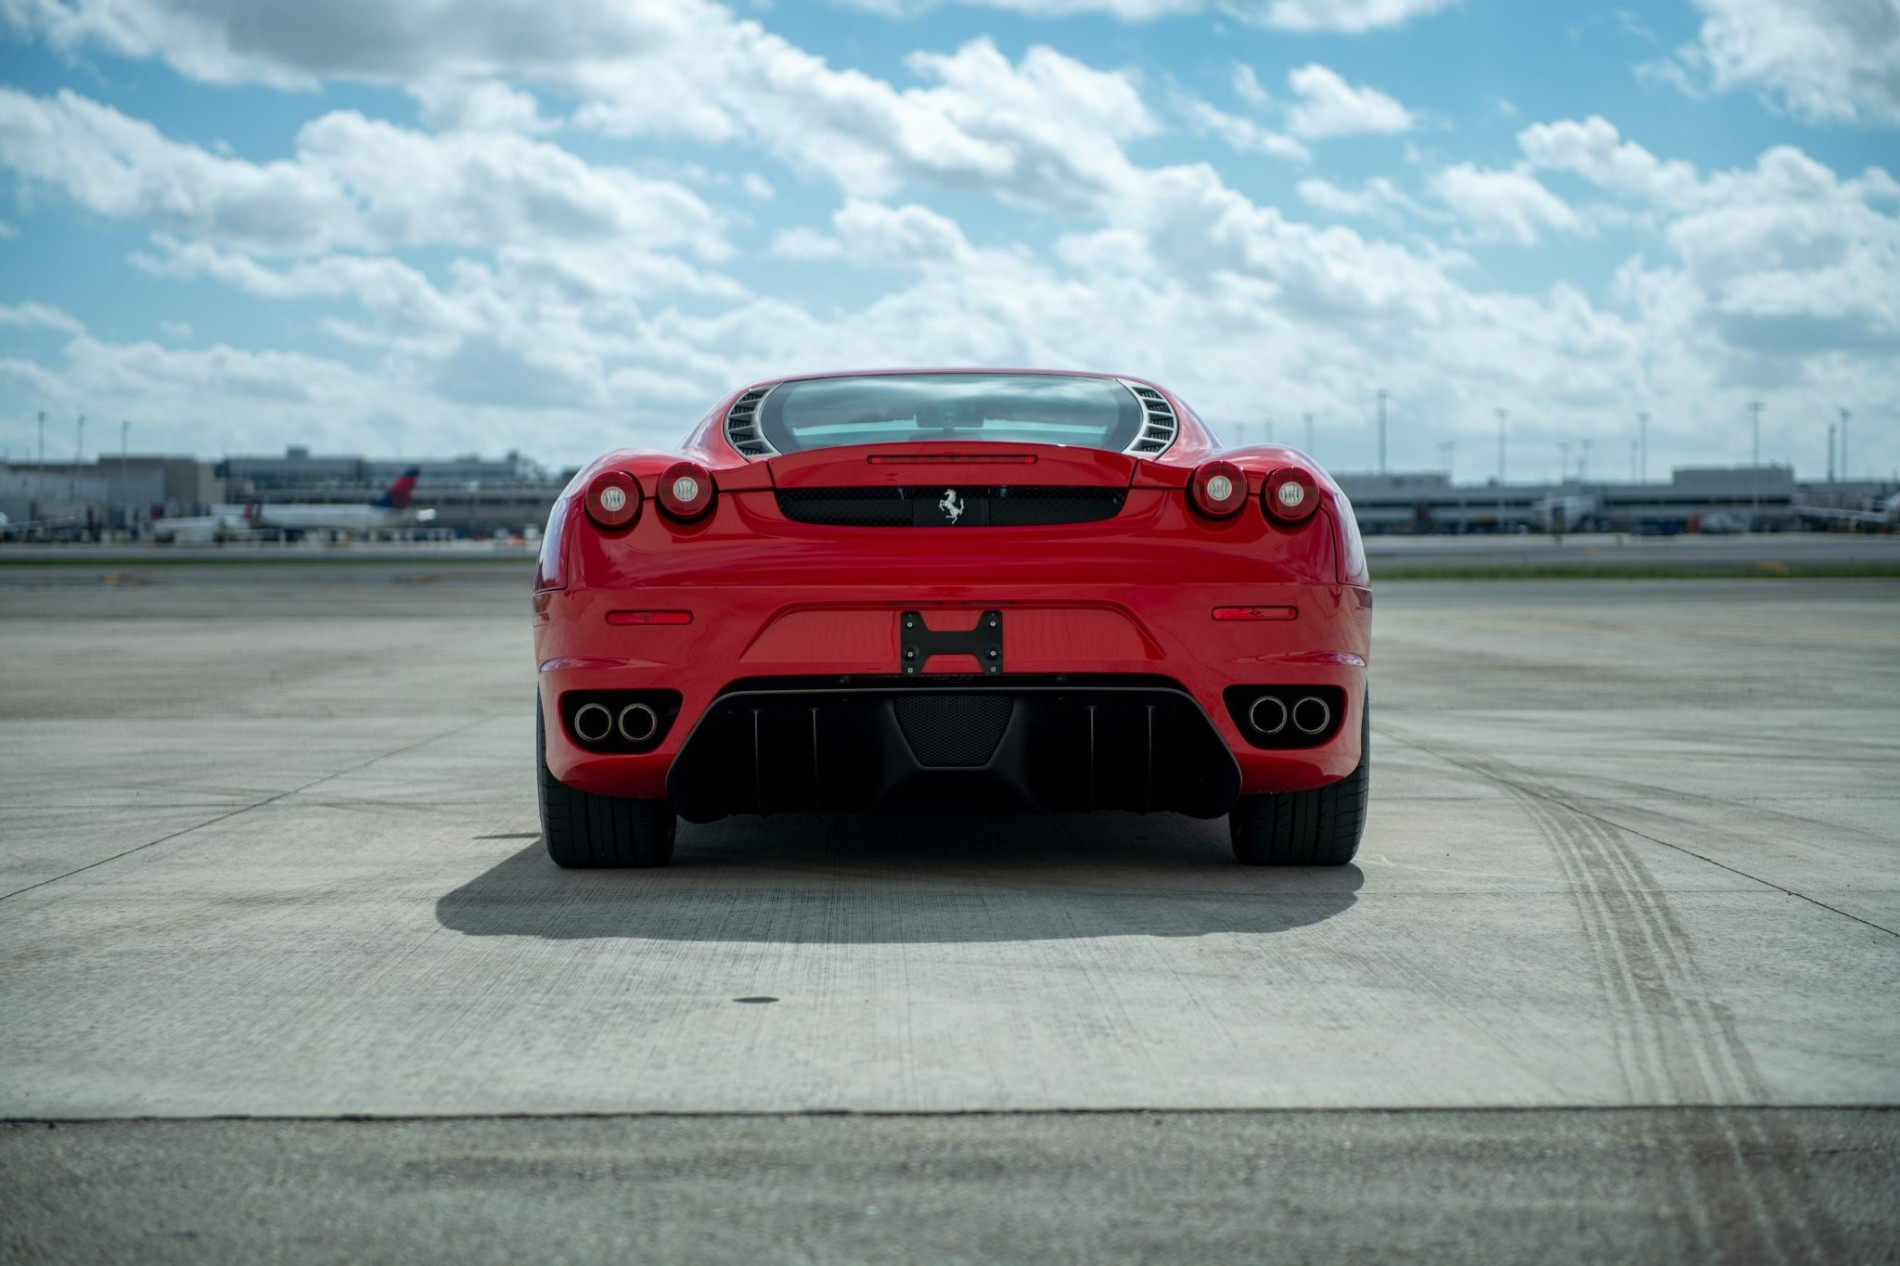 Ferrari F430 de vanzare - Ferrari F430 de vanzare